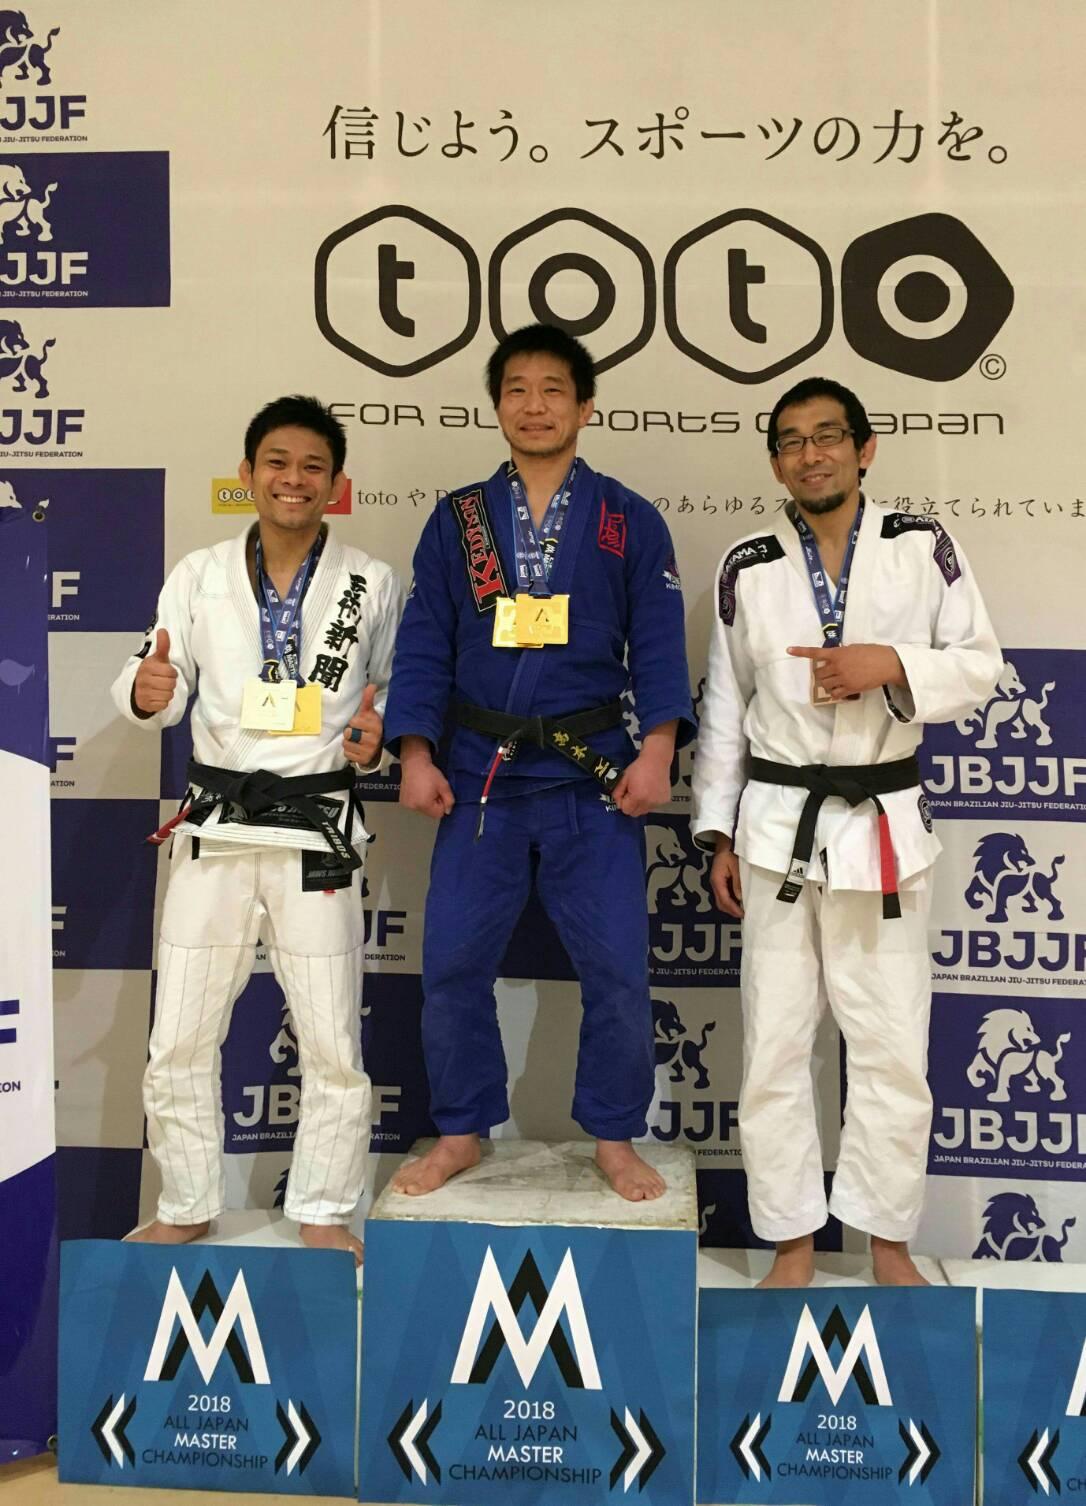 第12回全日本マスター柔術選手権|大会写真01